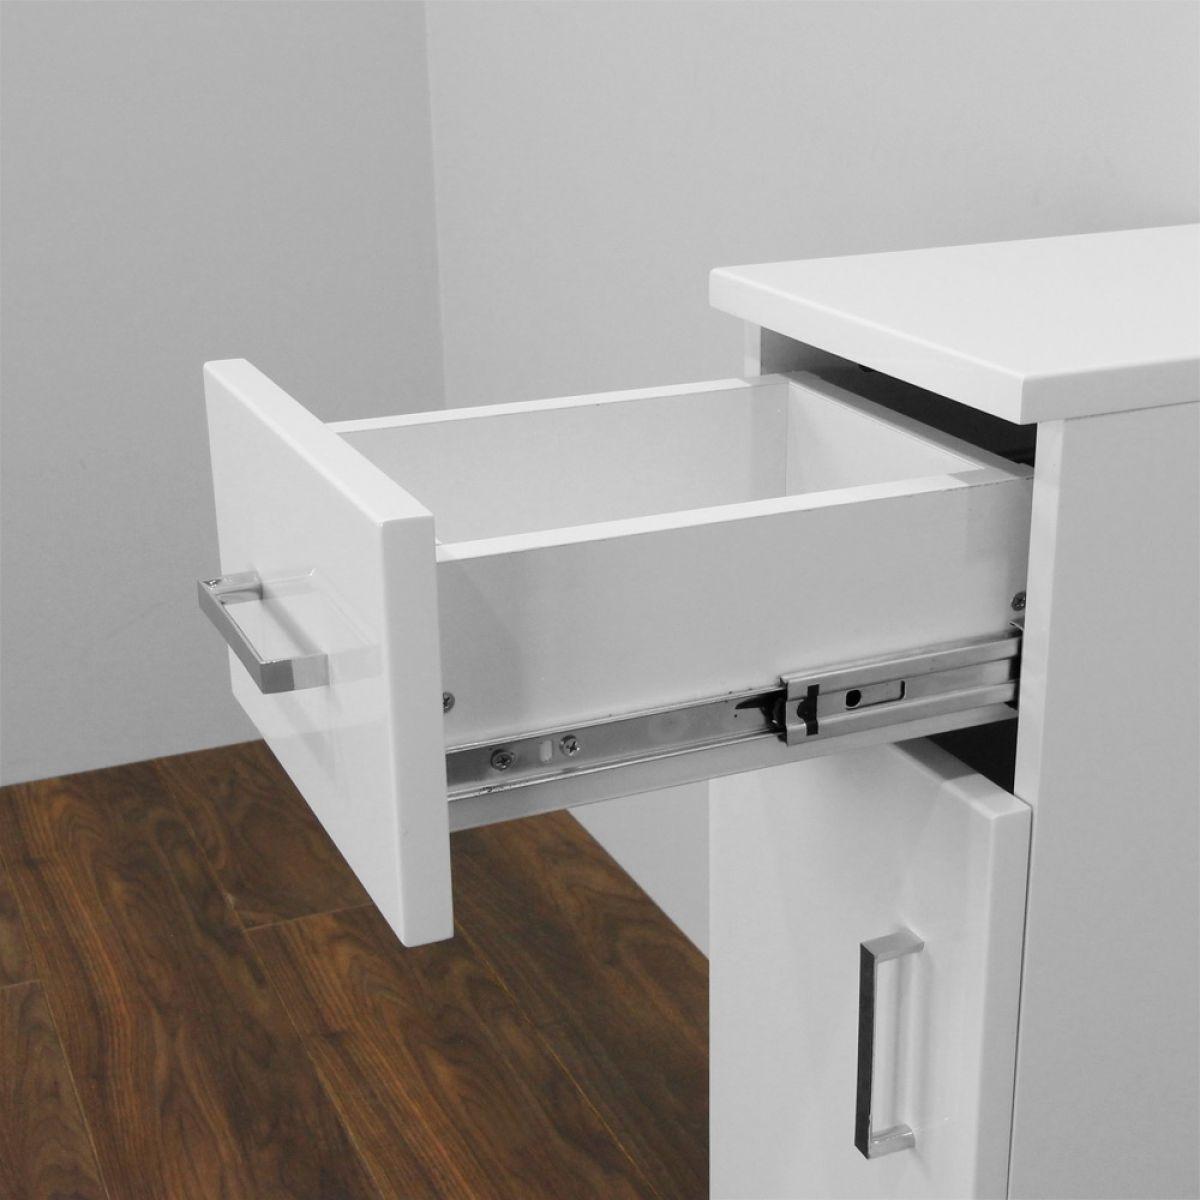 Premier High Gloss White Storage Cupboard - Drawer